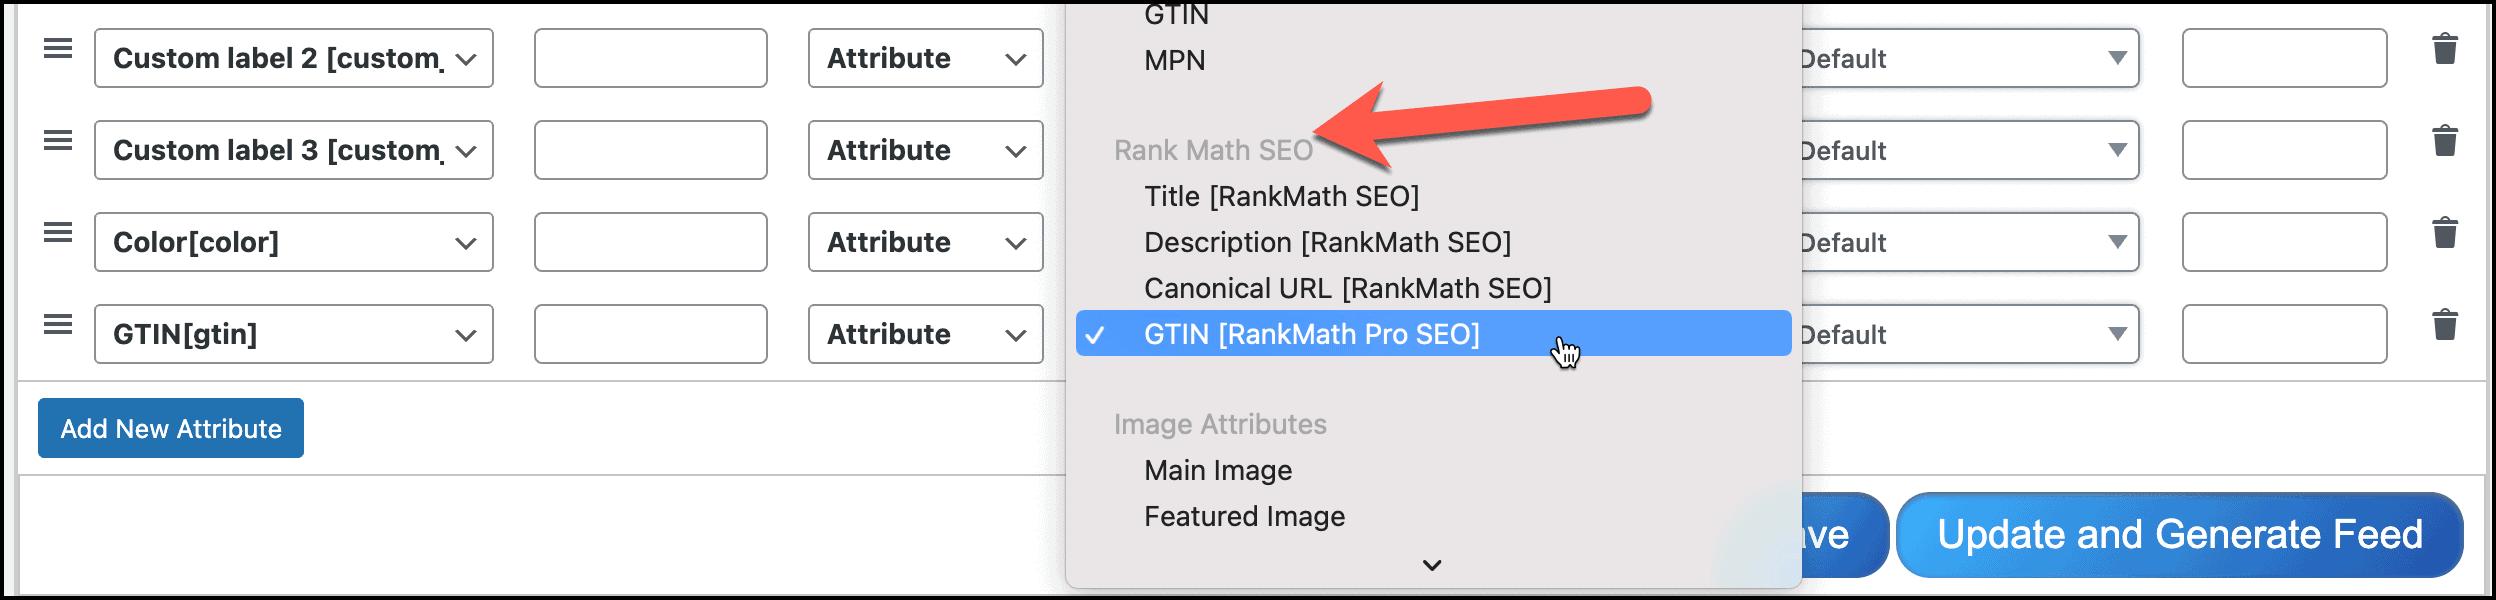 Configure Rank Math SEO Pro GTIN field into feed